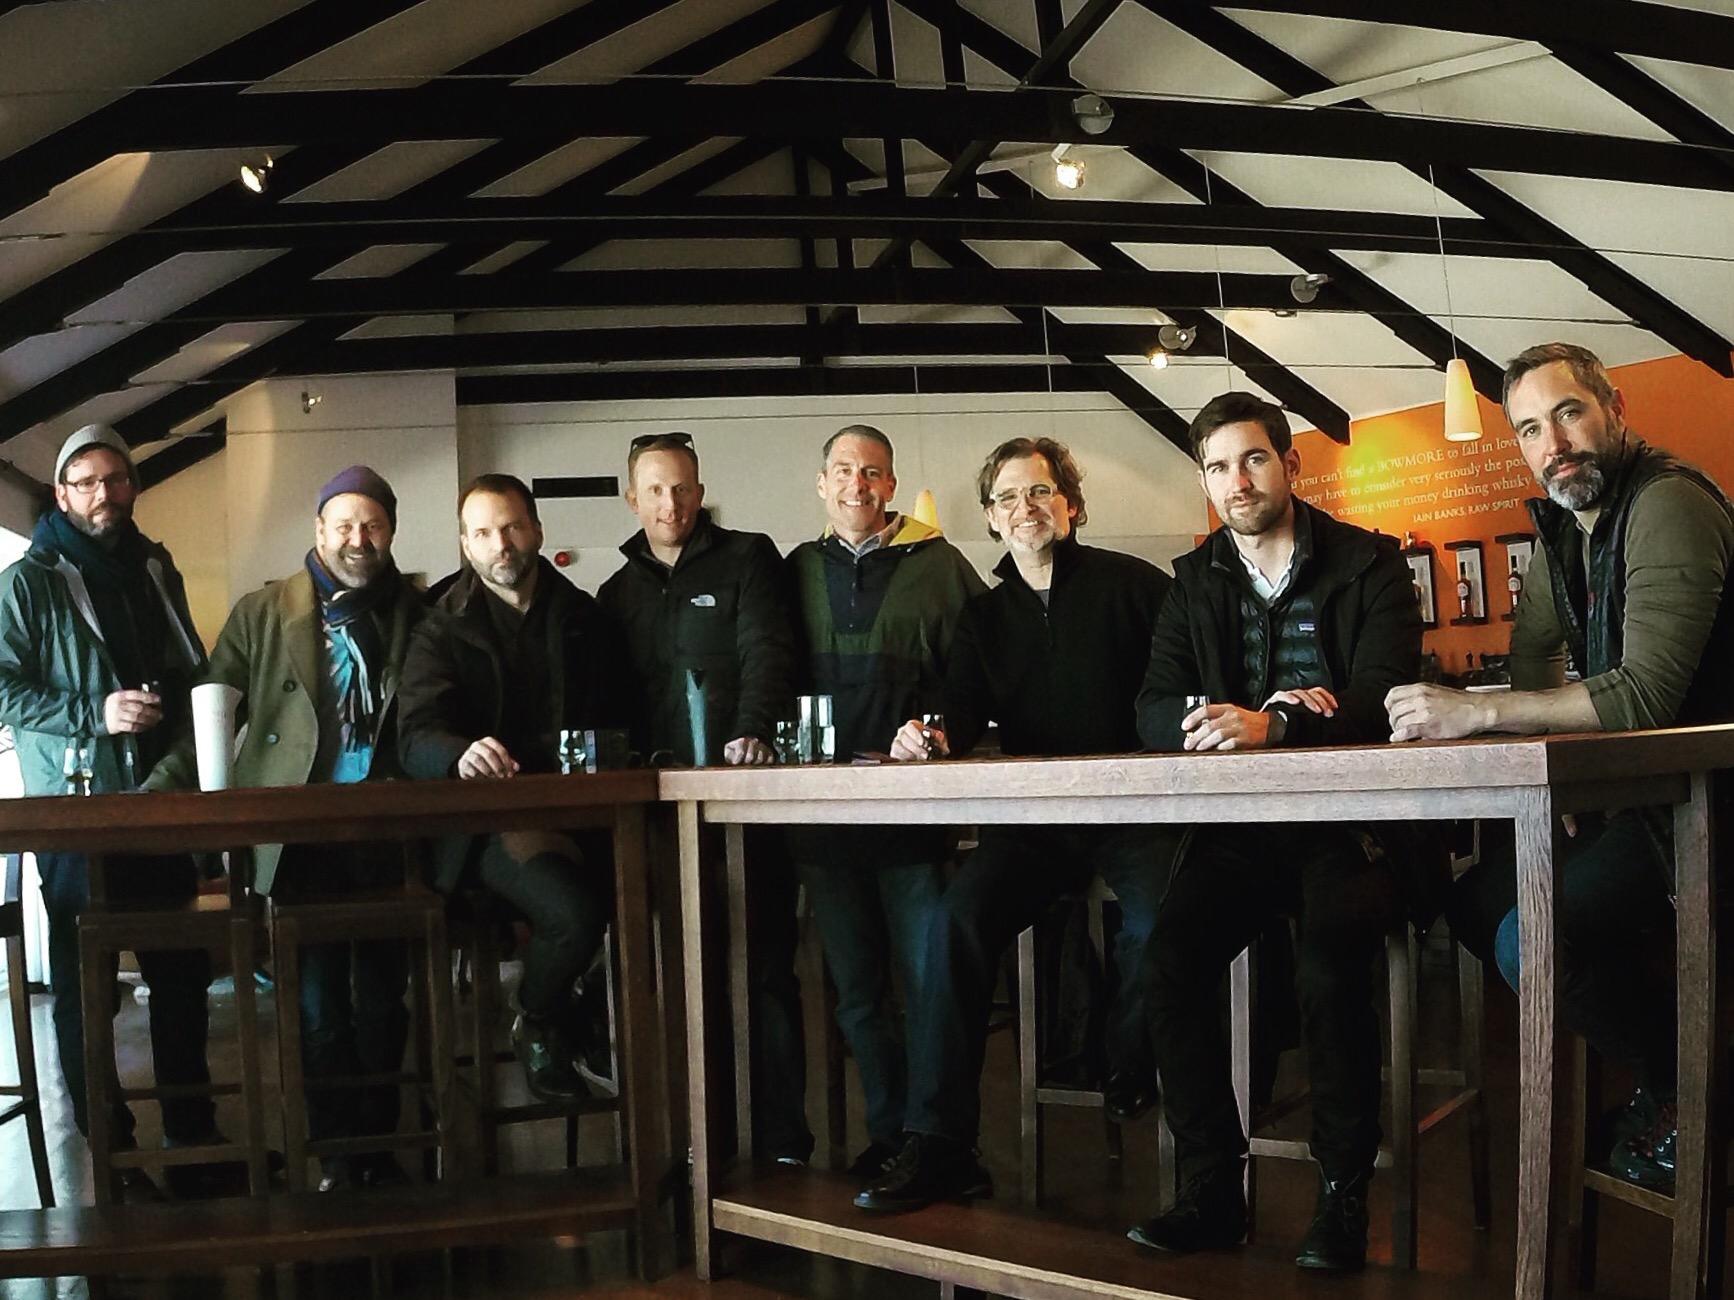 Gents a Bowmore Distillery